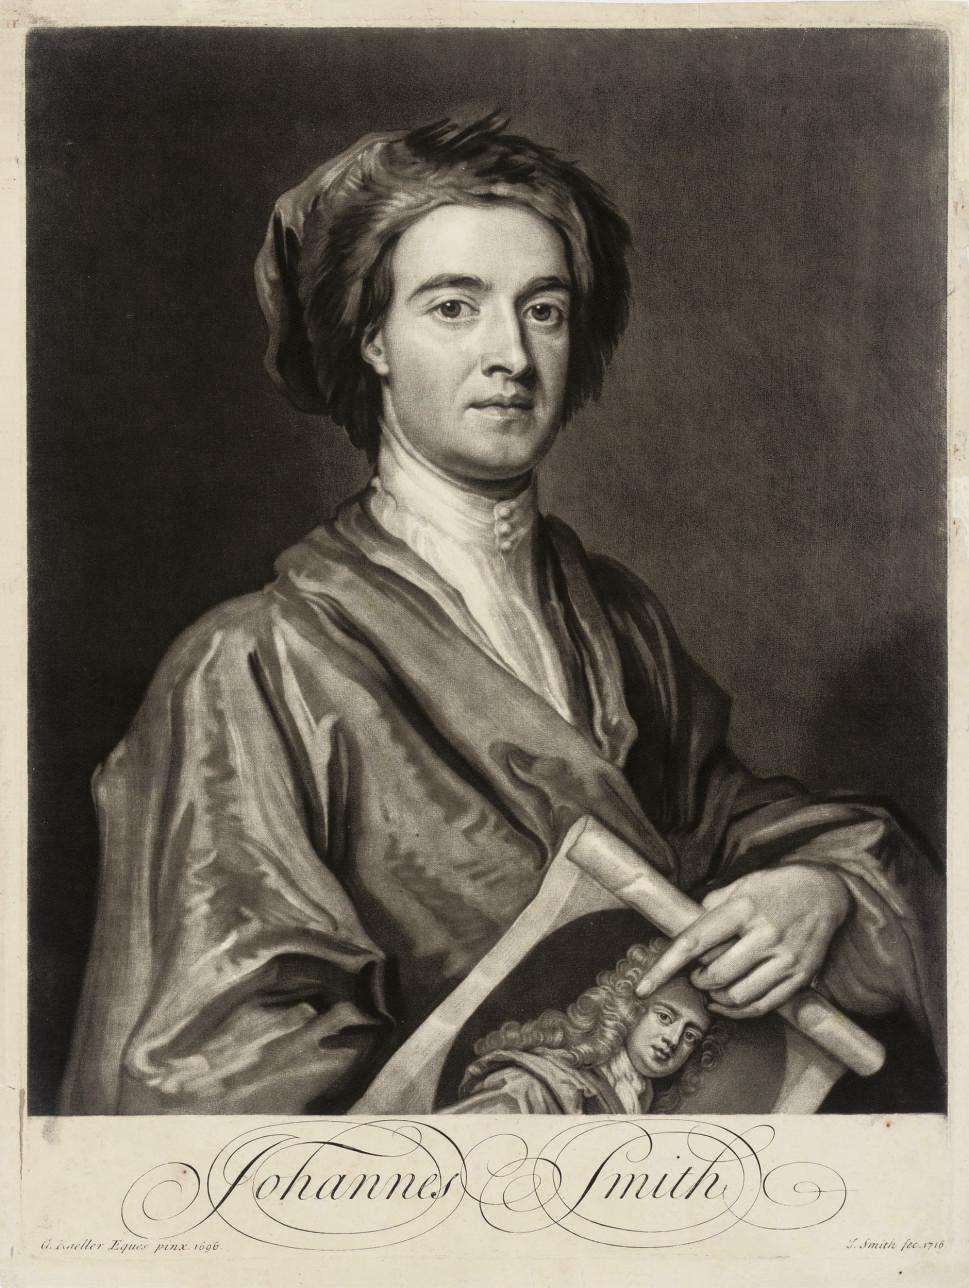 John Smith (1652-1742) after Godfrey Kneller